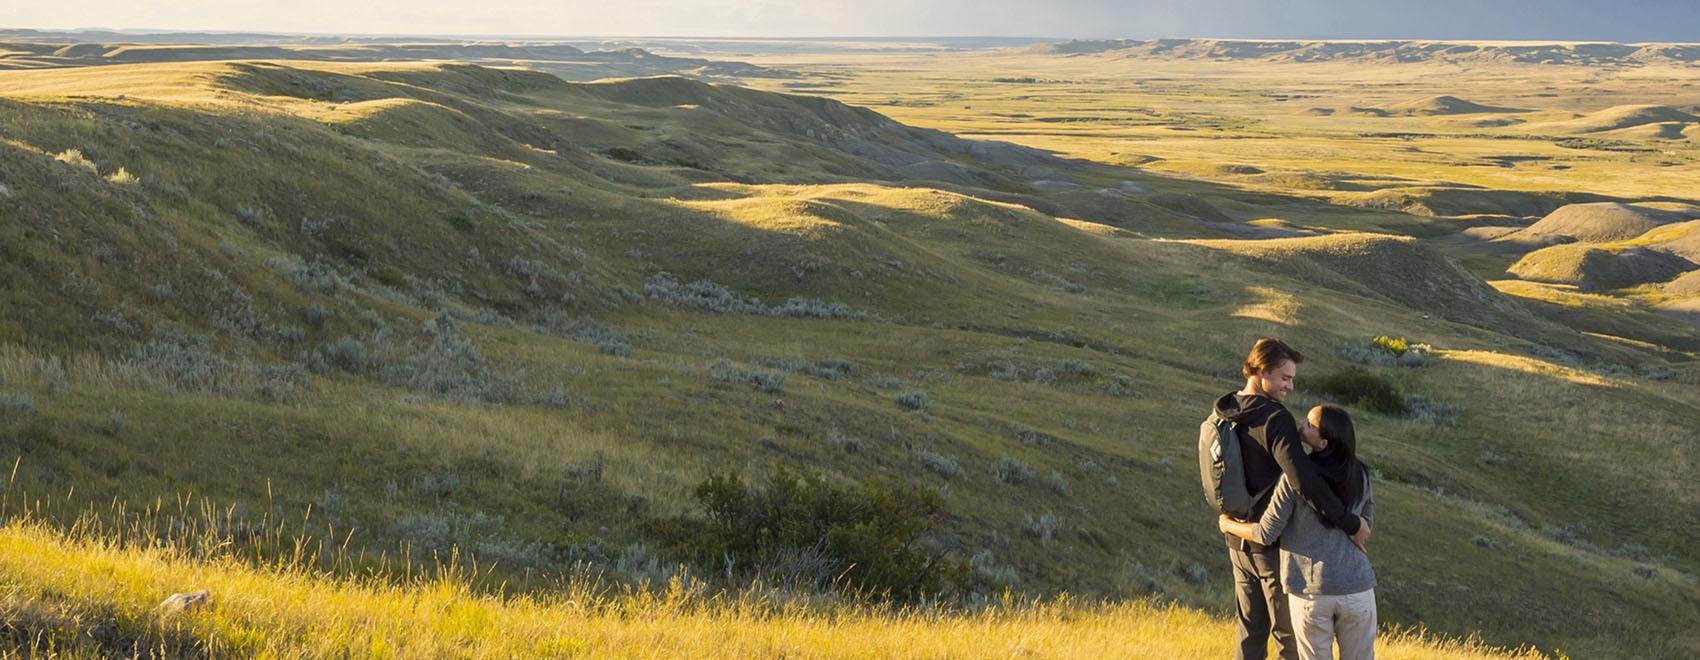 70 Mile Butte at Grasslands NP - Photo courtesy Tourism Sask